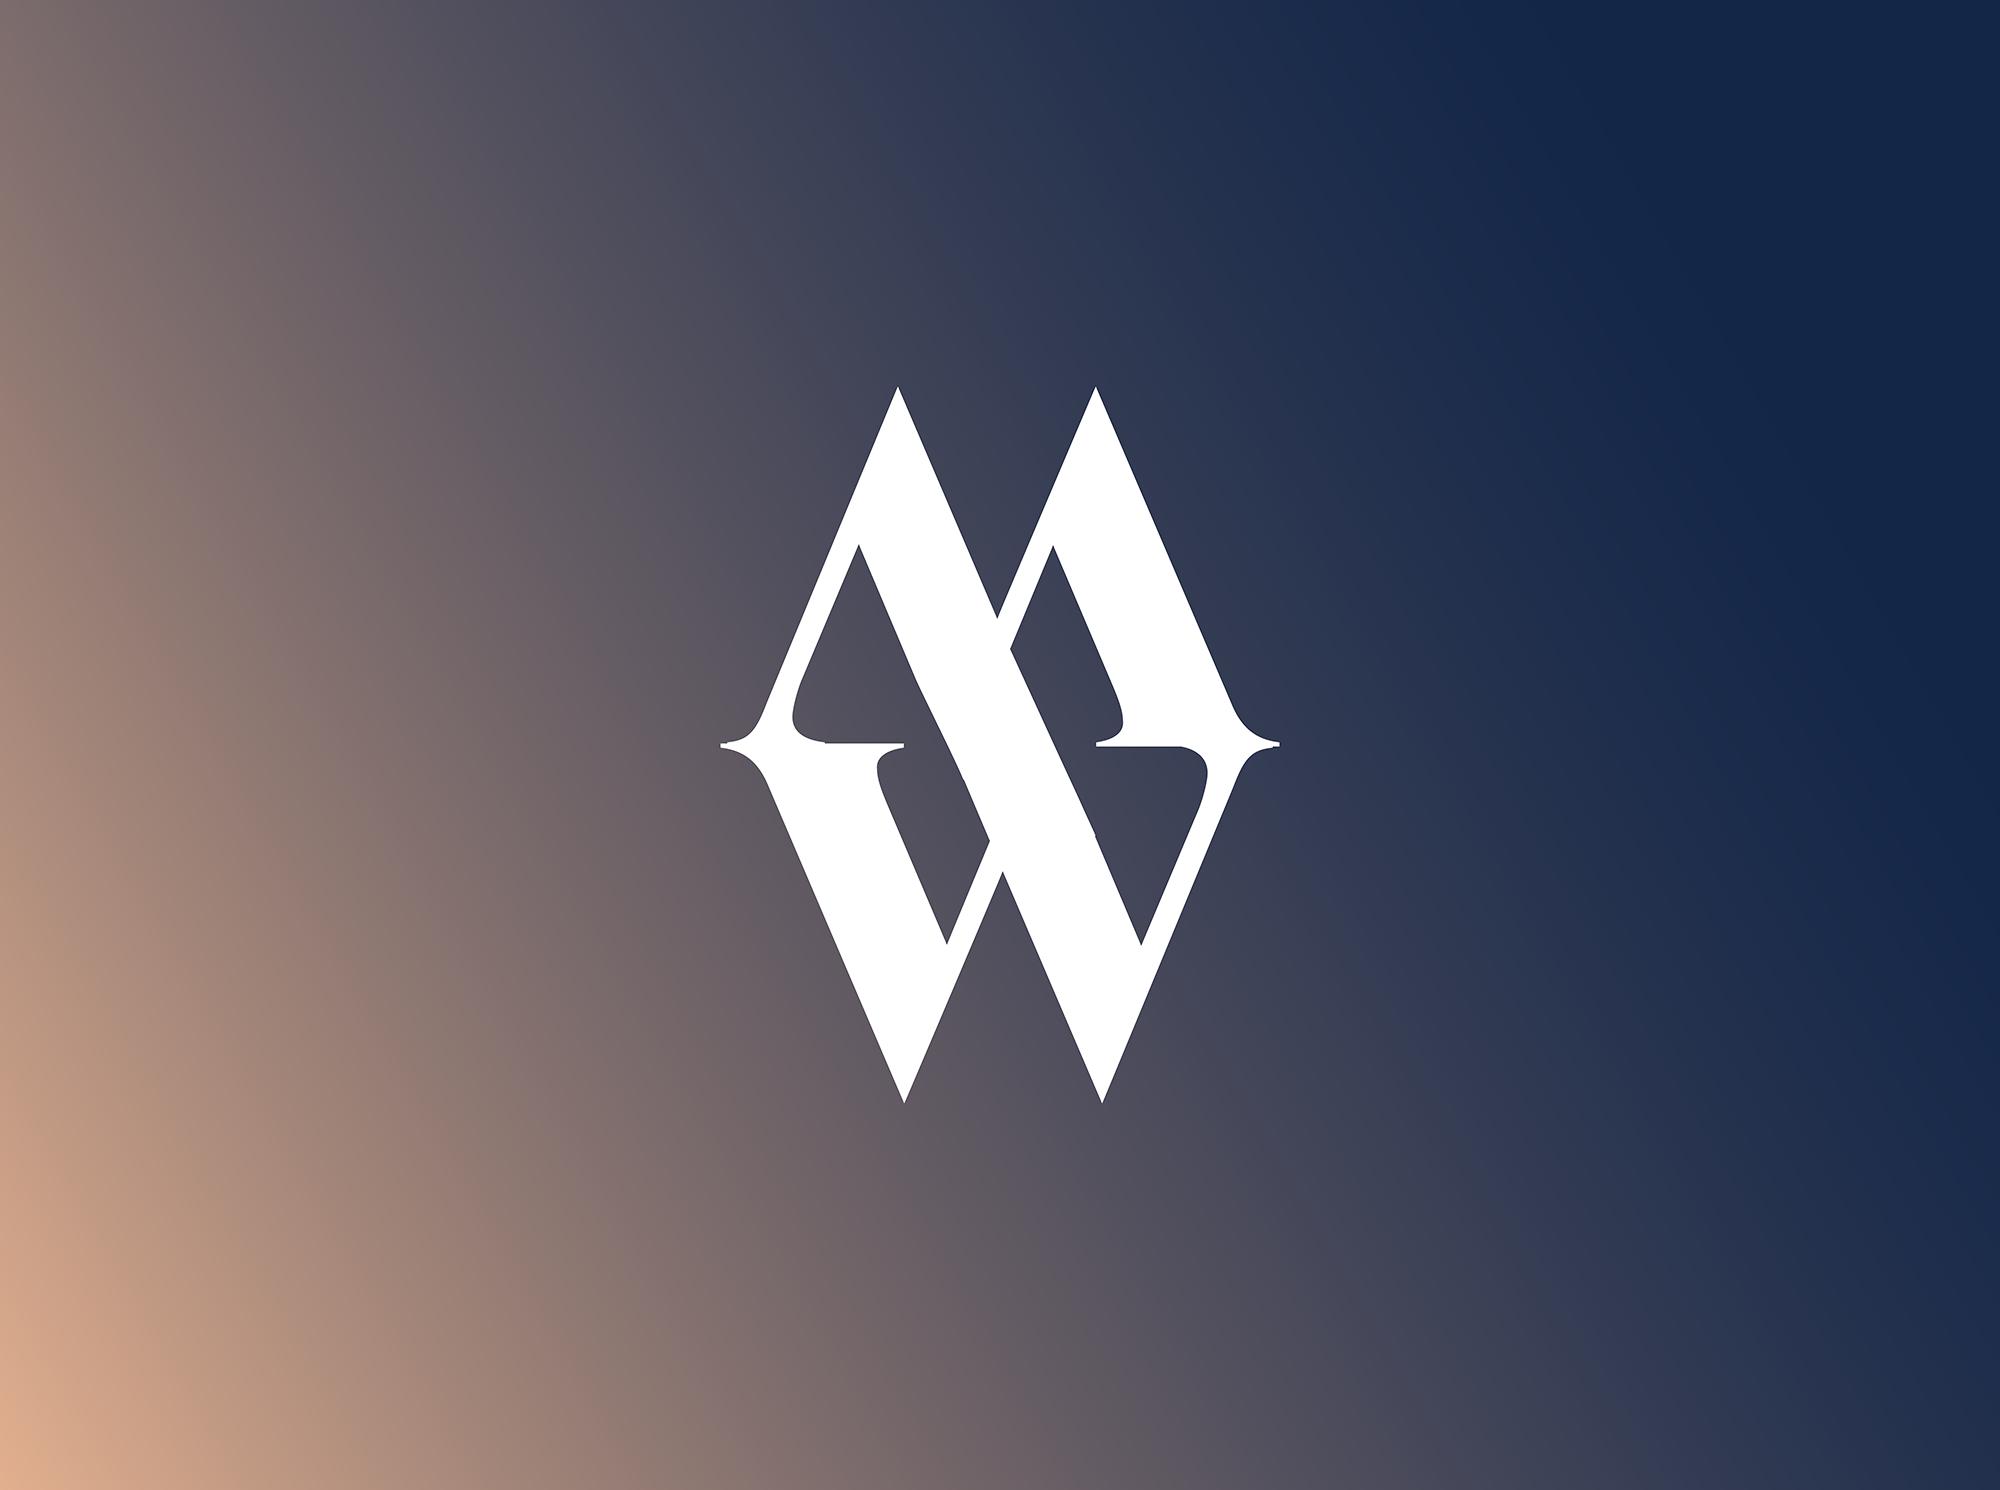 MWEK Logo variation on a pink blending with navy gradient background